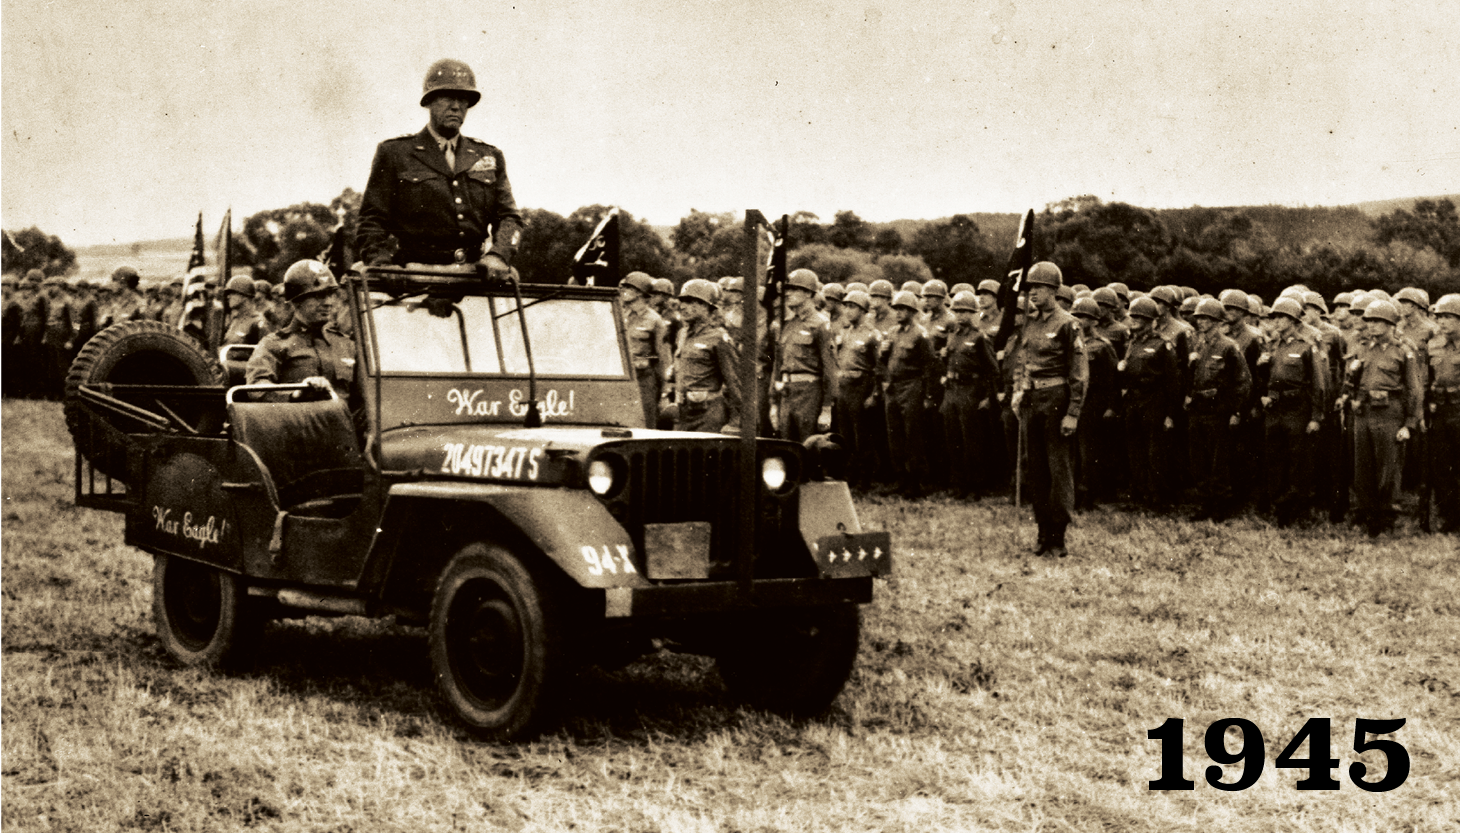 General Patton riding a